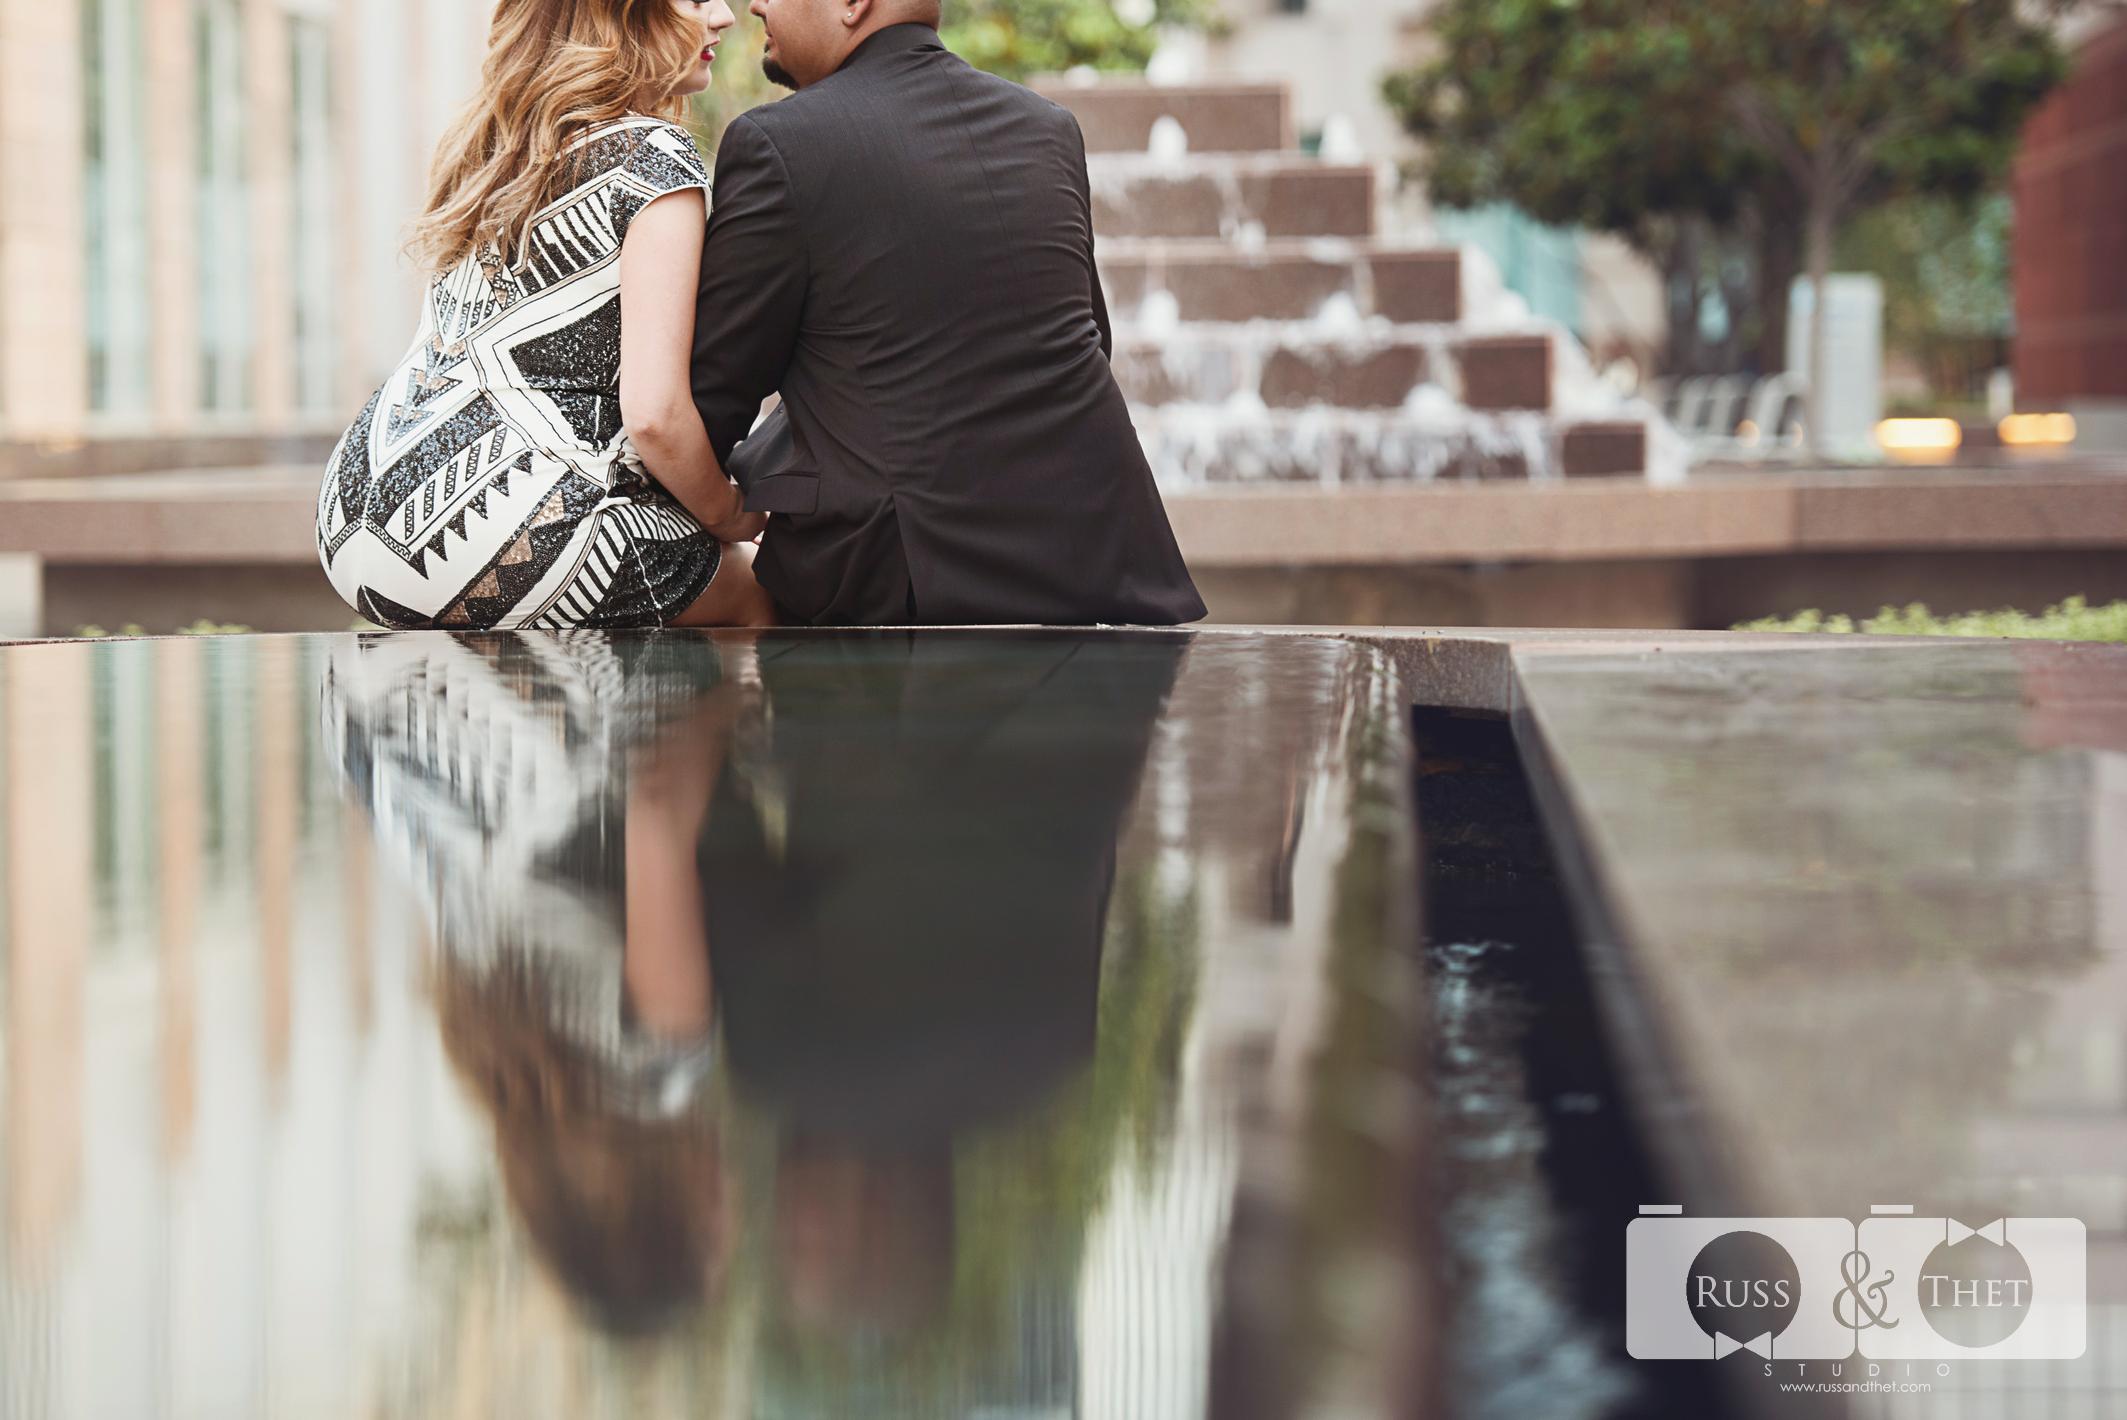 los-angeles-engagement-photographer (11).jpg